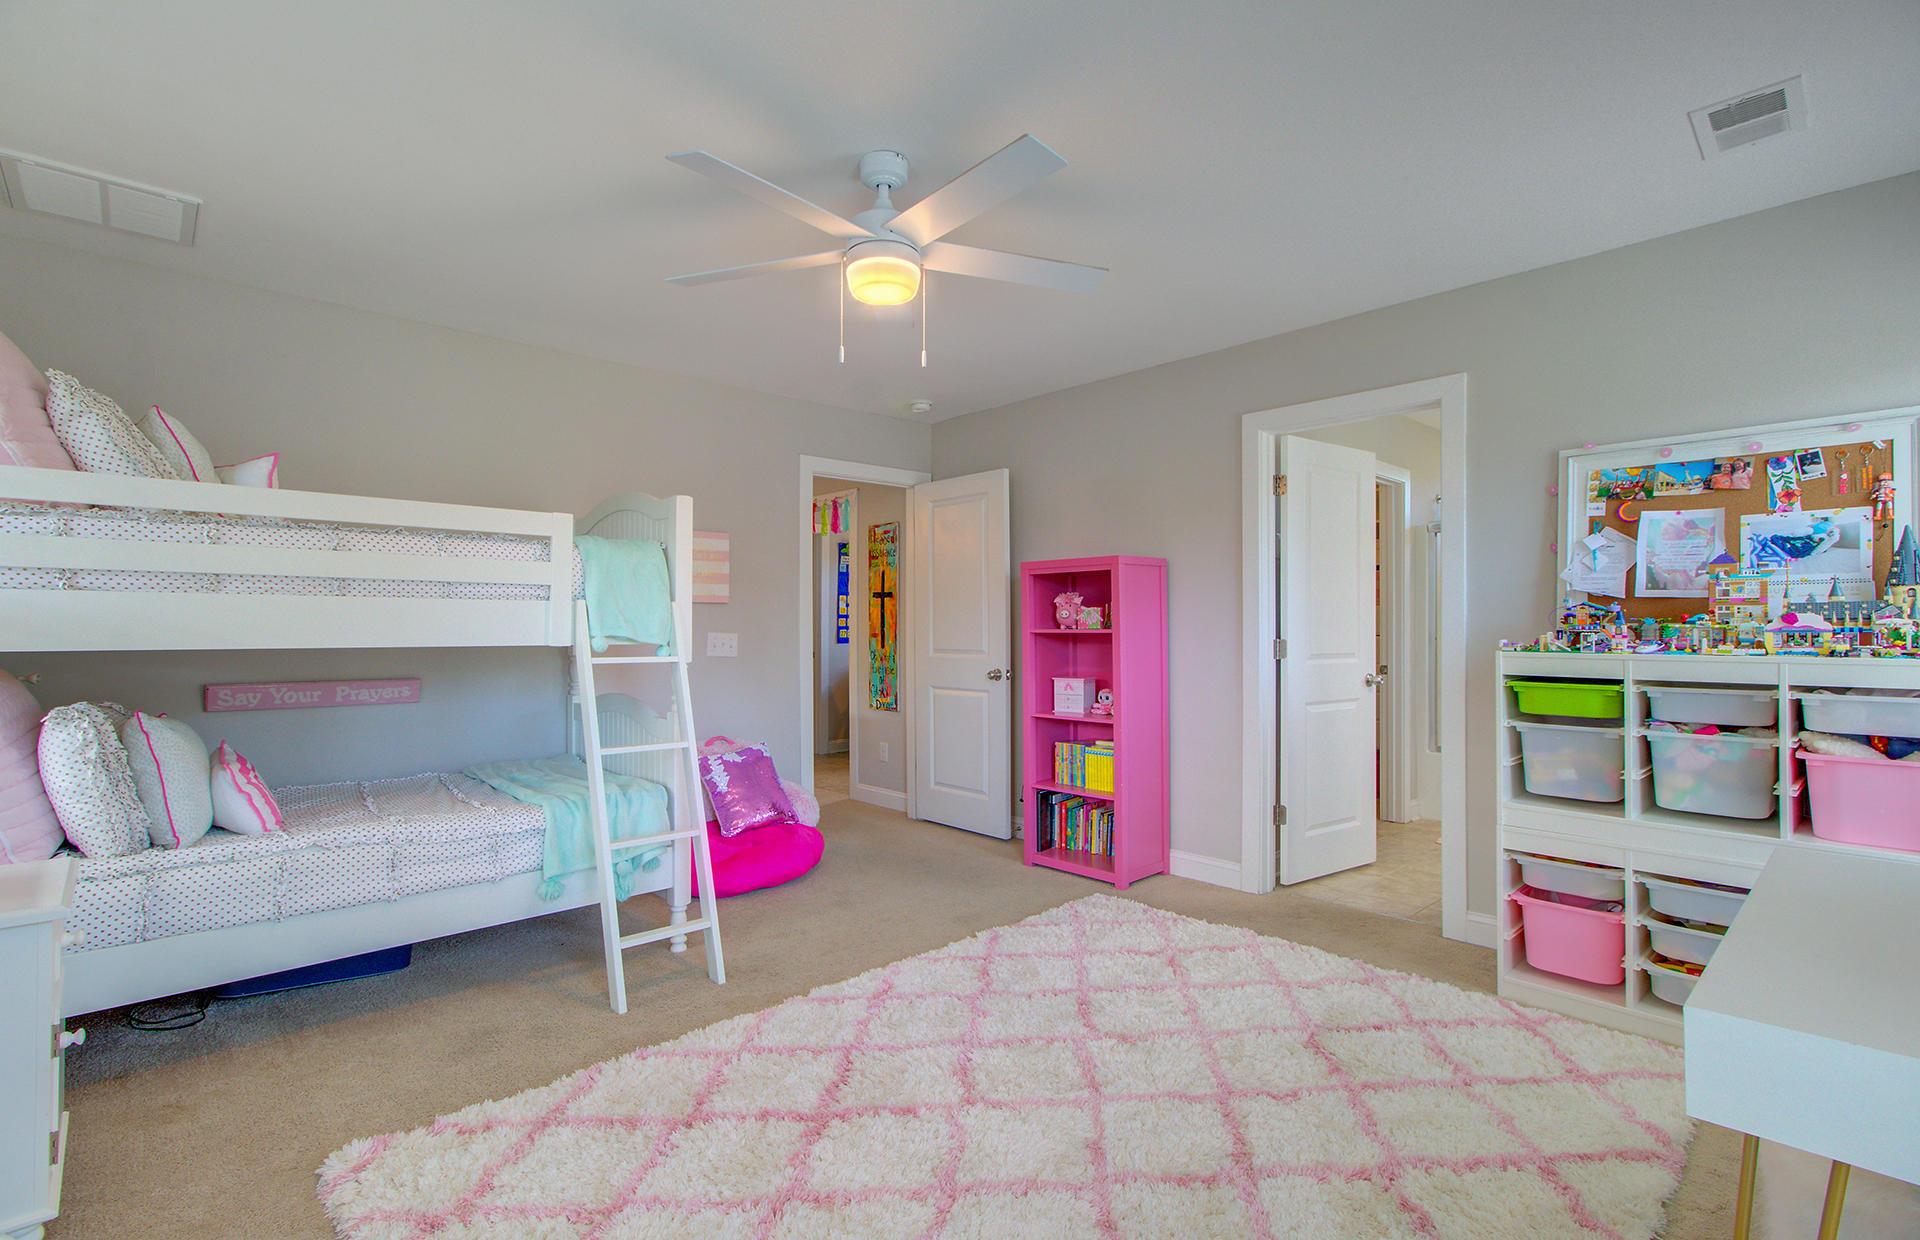 Copahee Landing Homes For Sale - 3726 Copahee Sound, Mount Pleasant, SC - 41